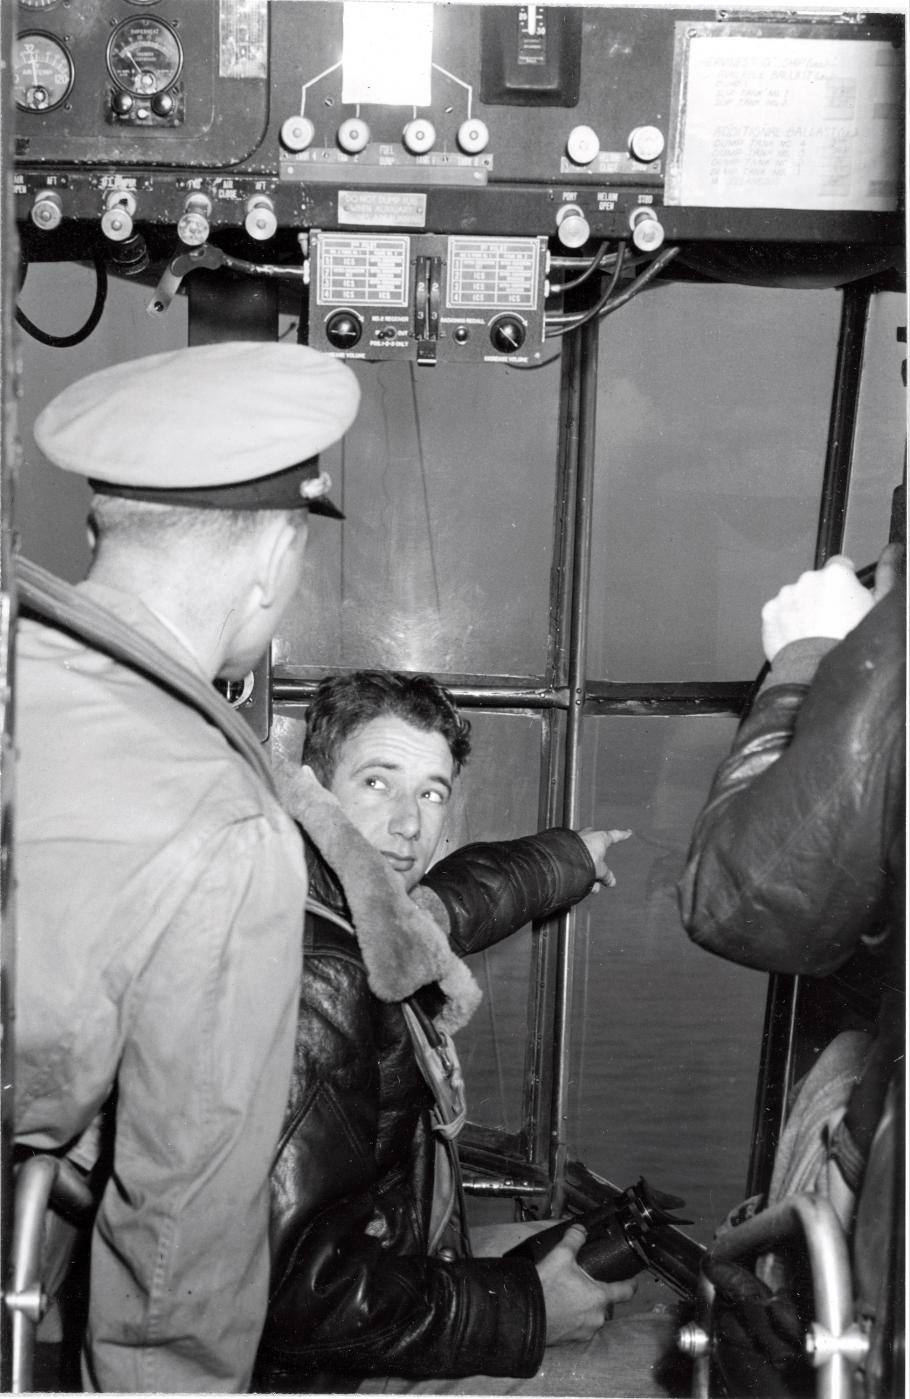 Three airmen inside K-ship cabin